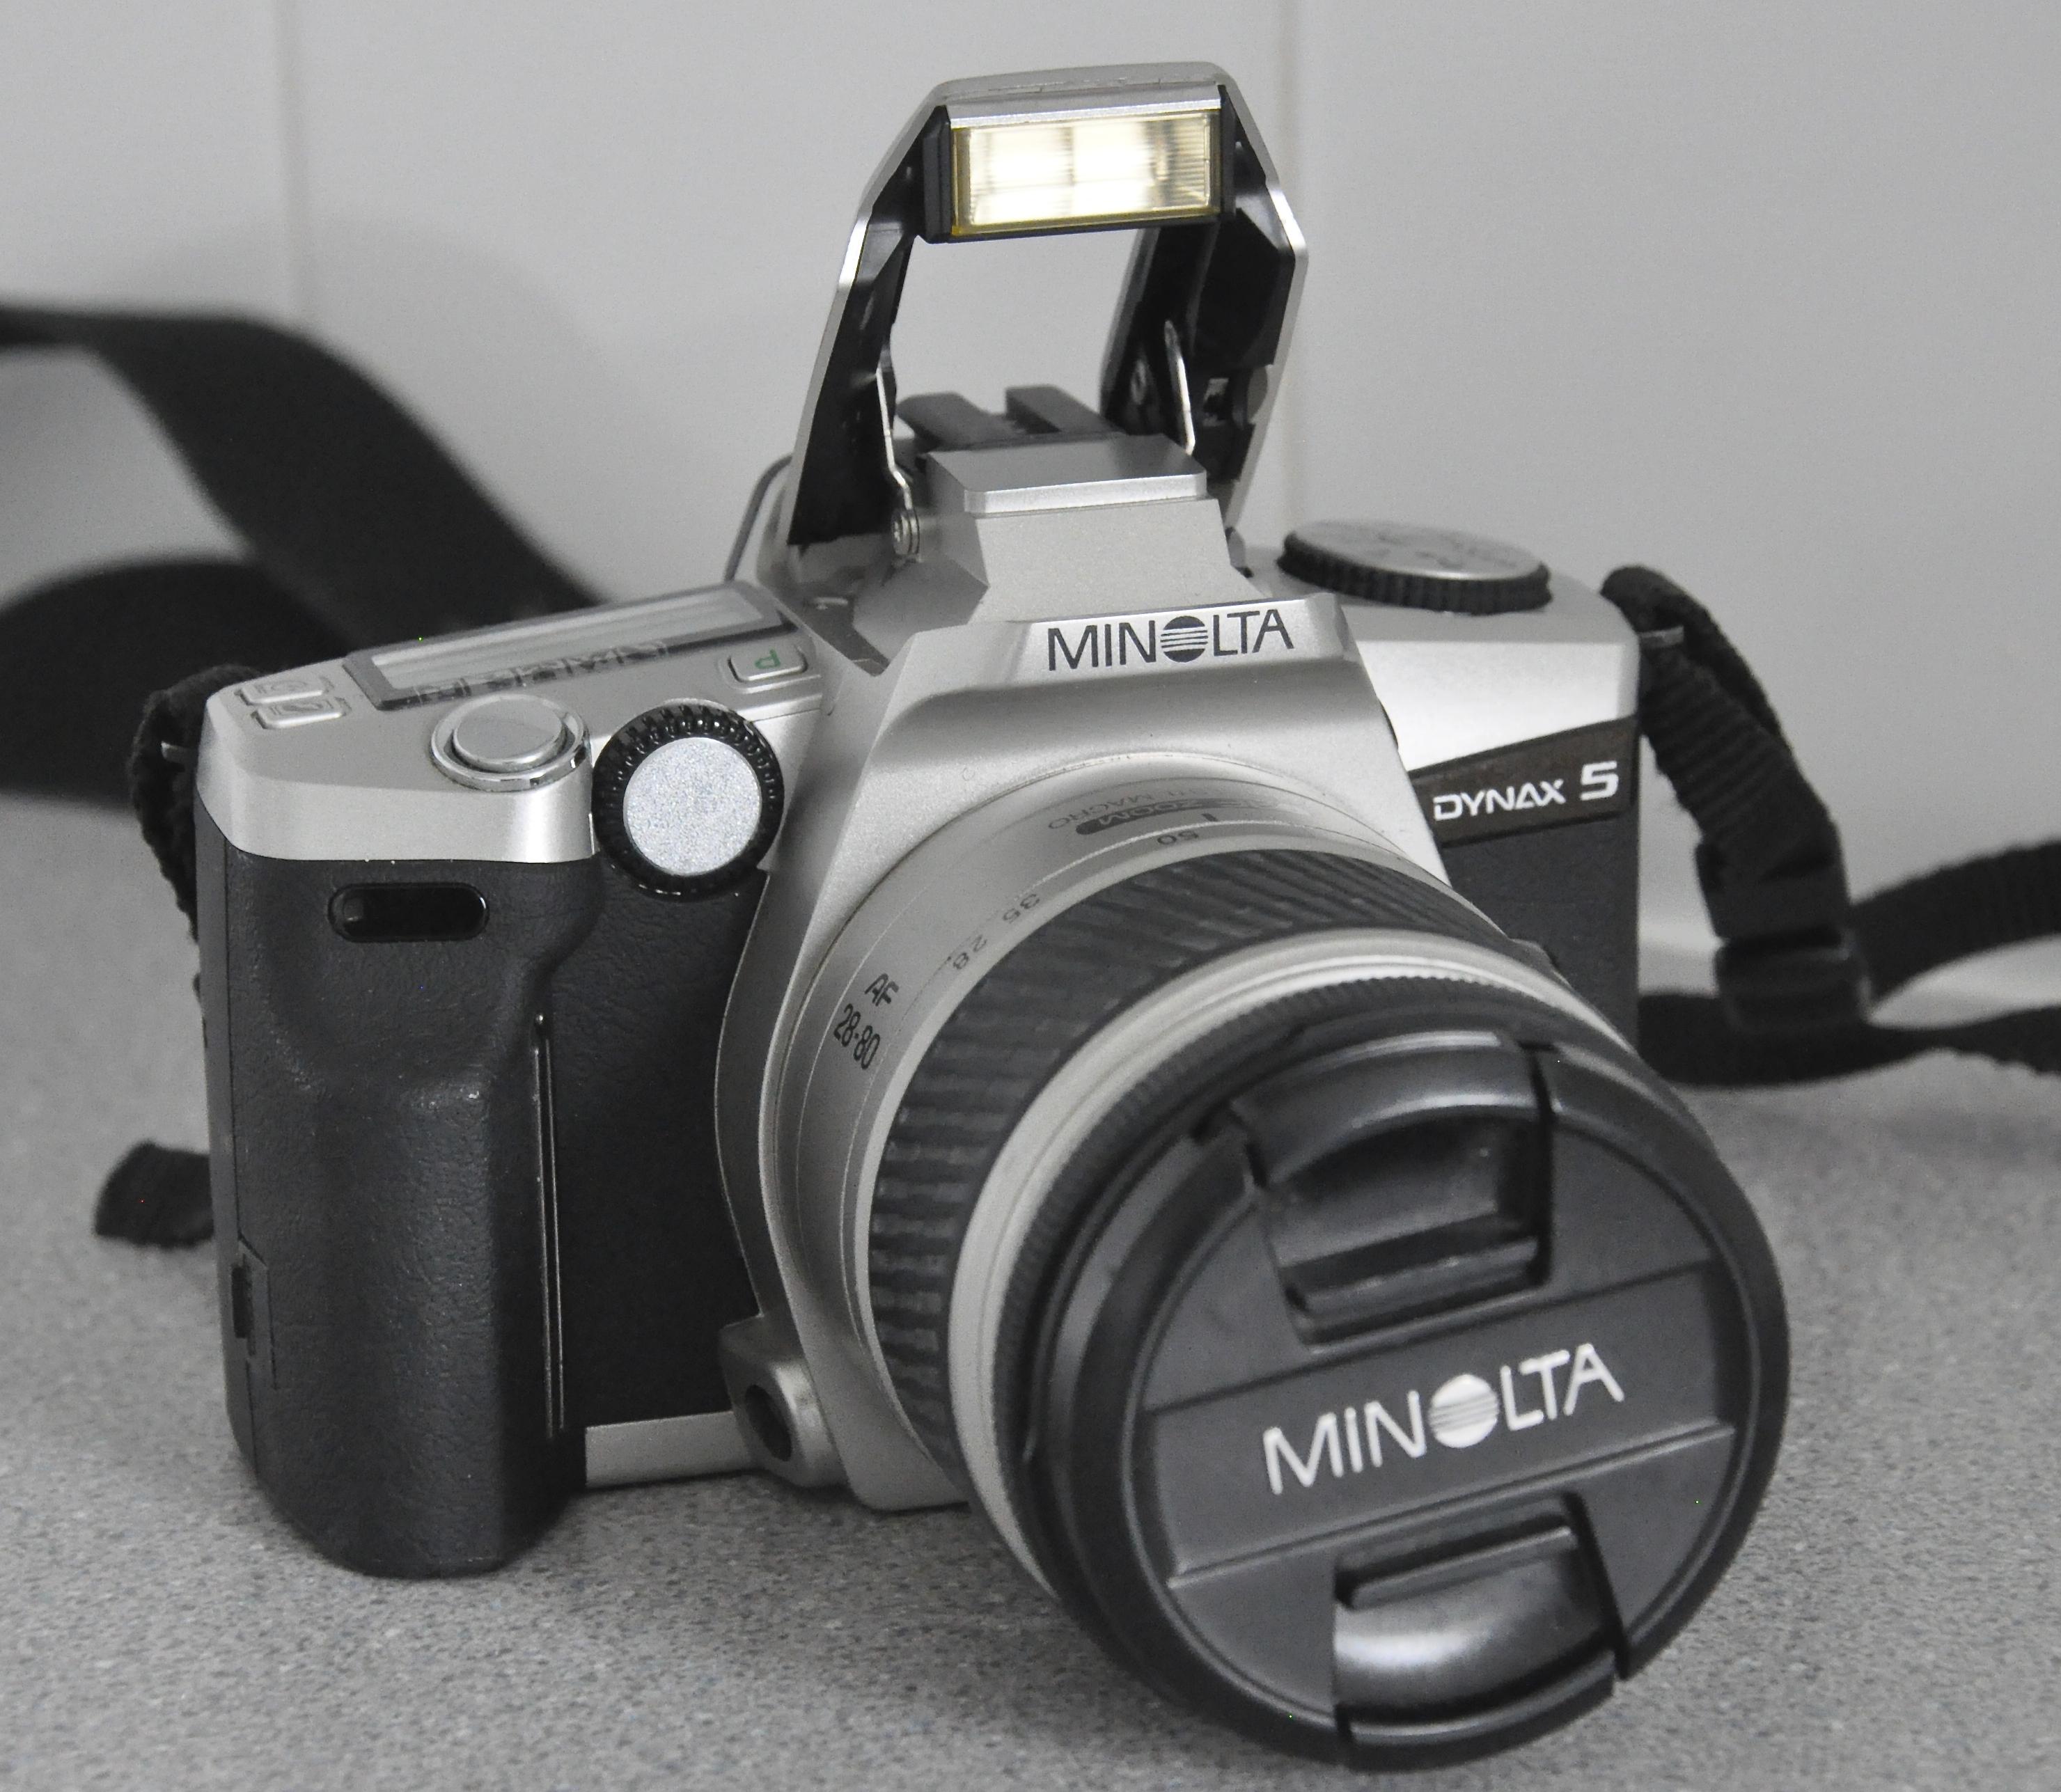 file minolta dynax 5 28 80 minolta lens analogue film camera jpg rh commons wikimedia org minolta dynax 5 instruction manual Dynax America